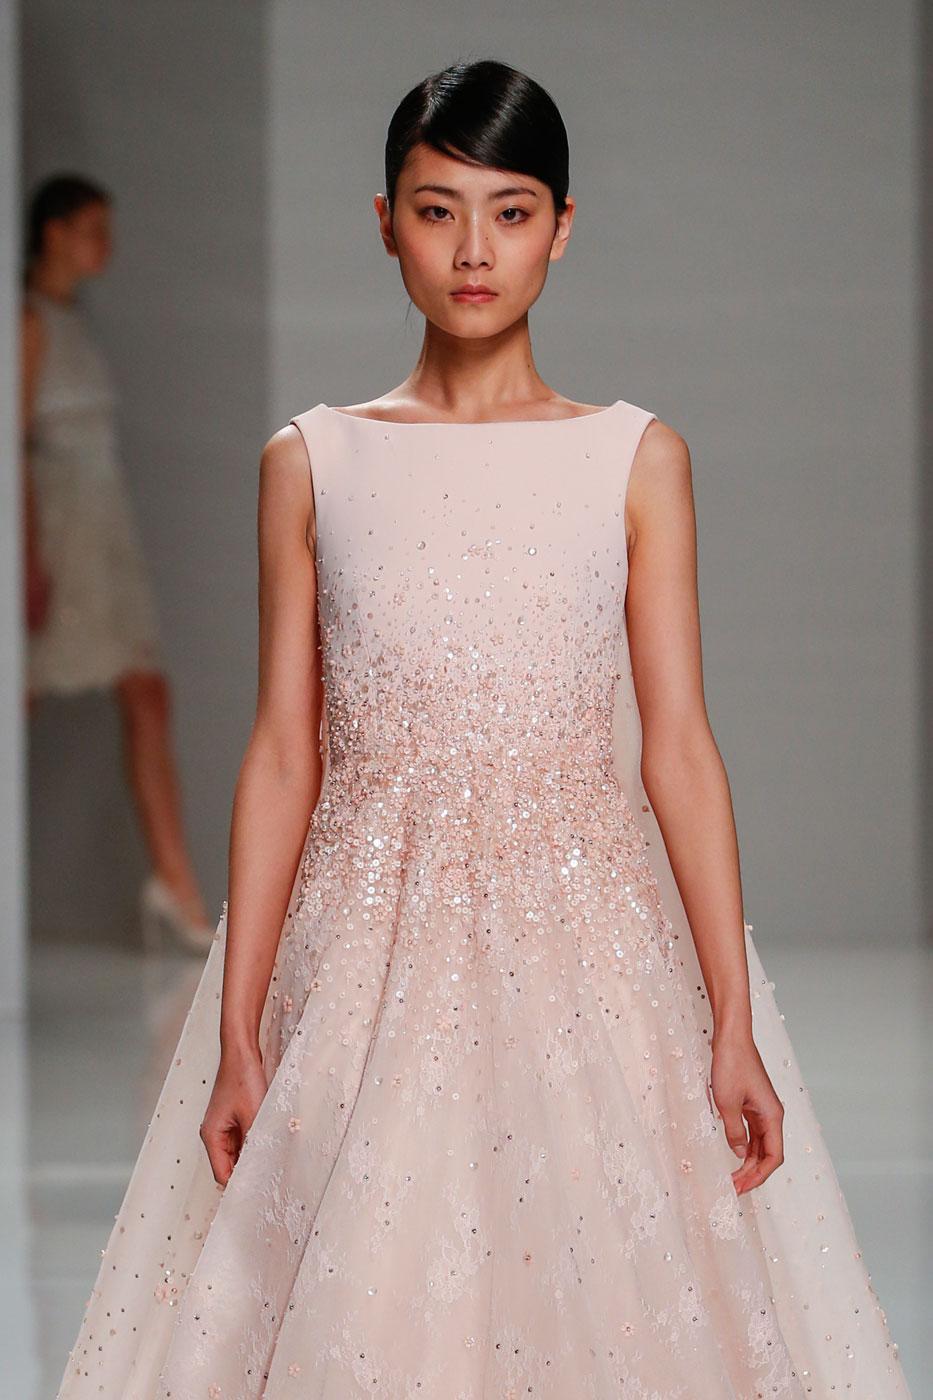 Georges-Hobeika-fashion-runway-show-haute-couture-paris-spring-2015-the-impression-66